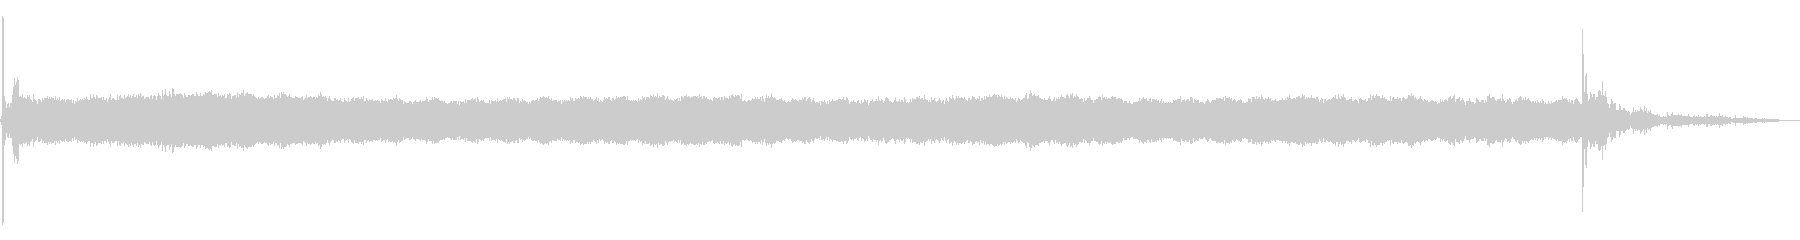 FRIDGEコンプレッサー:開始、...の未再生の波形